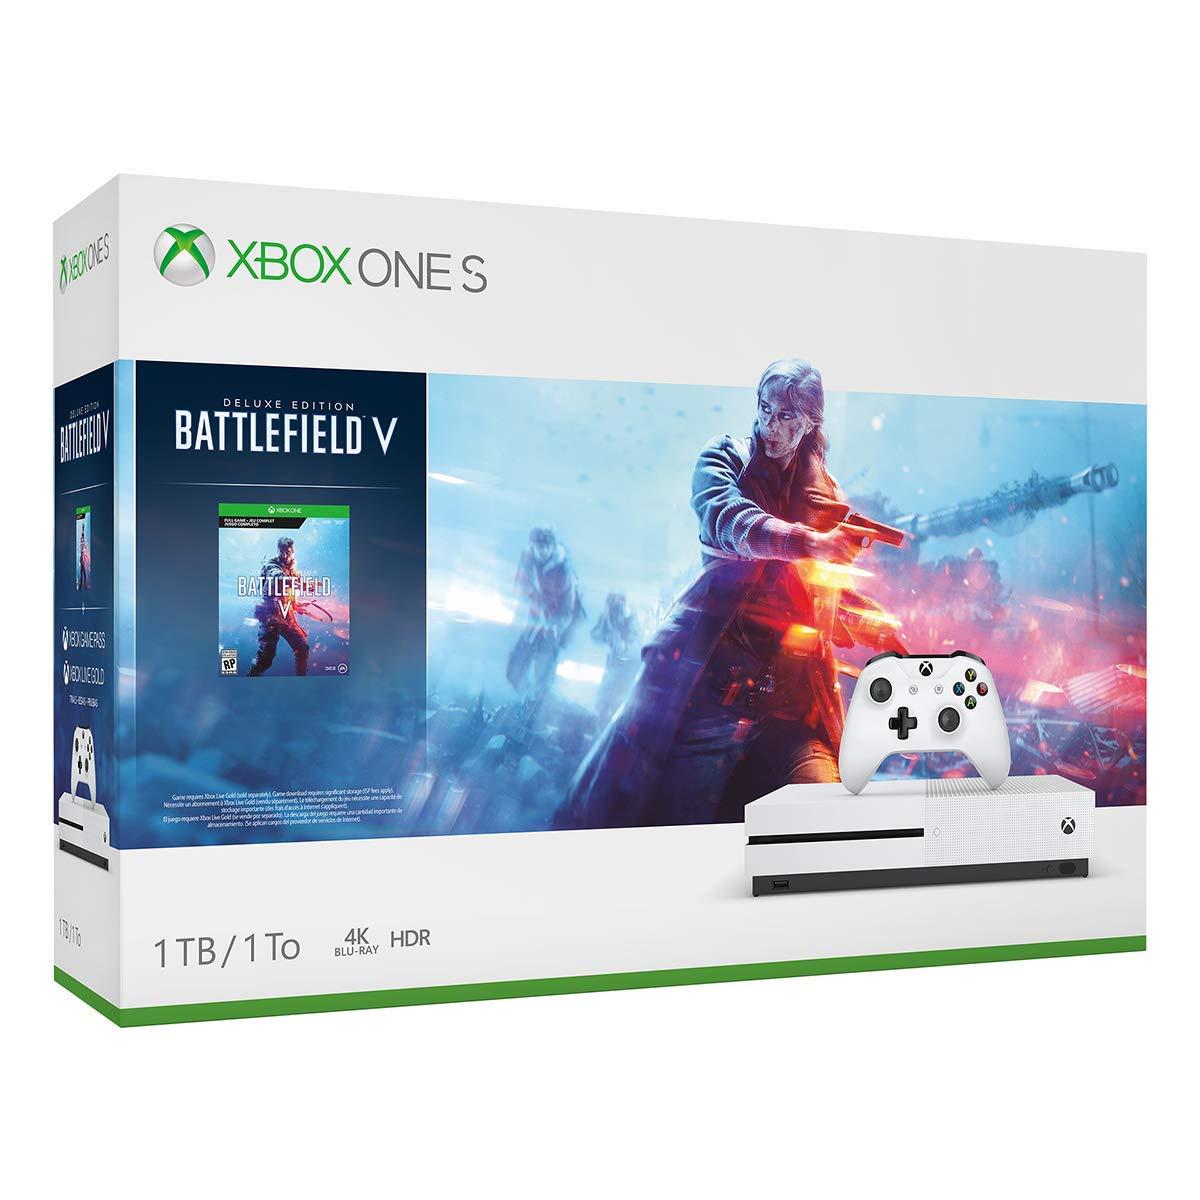 Xbox One S 1TB Console - Battlefield V Bundle (Renewed)